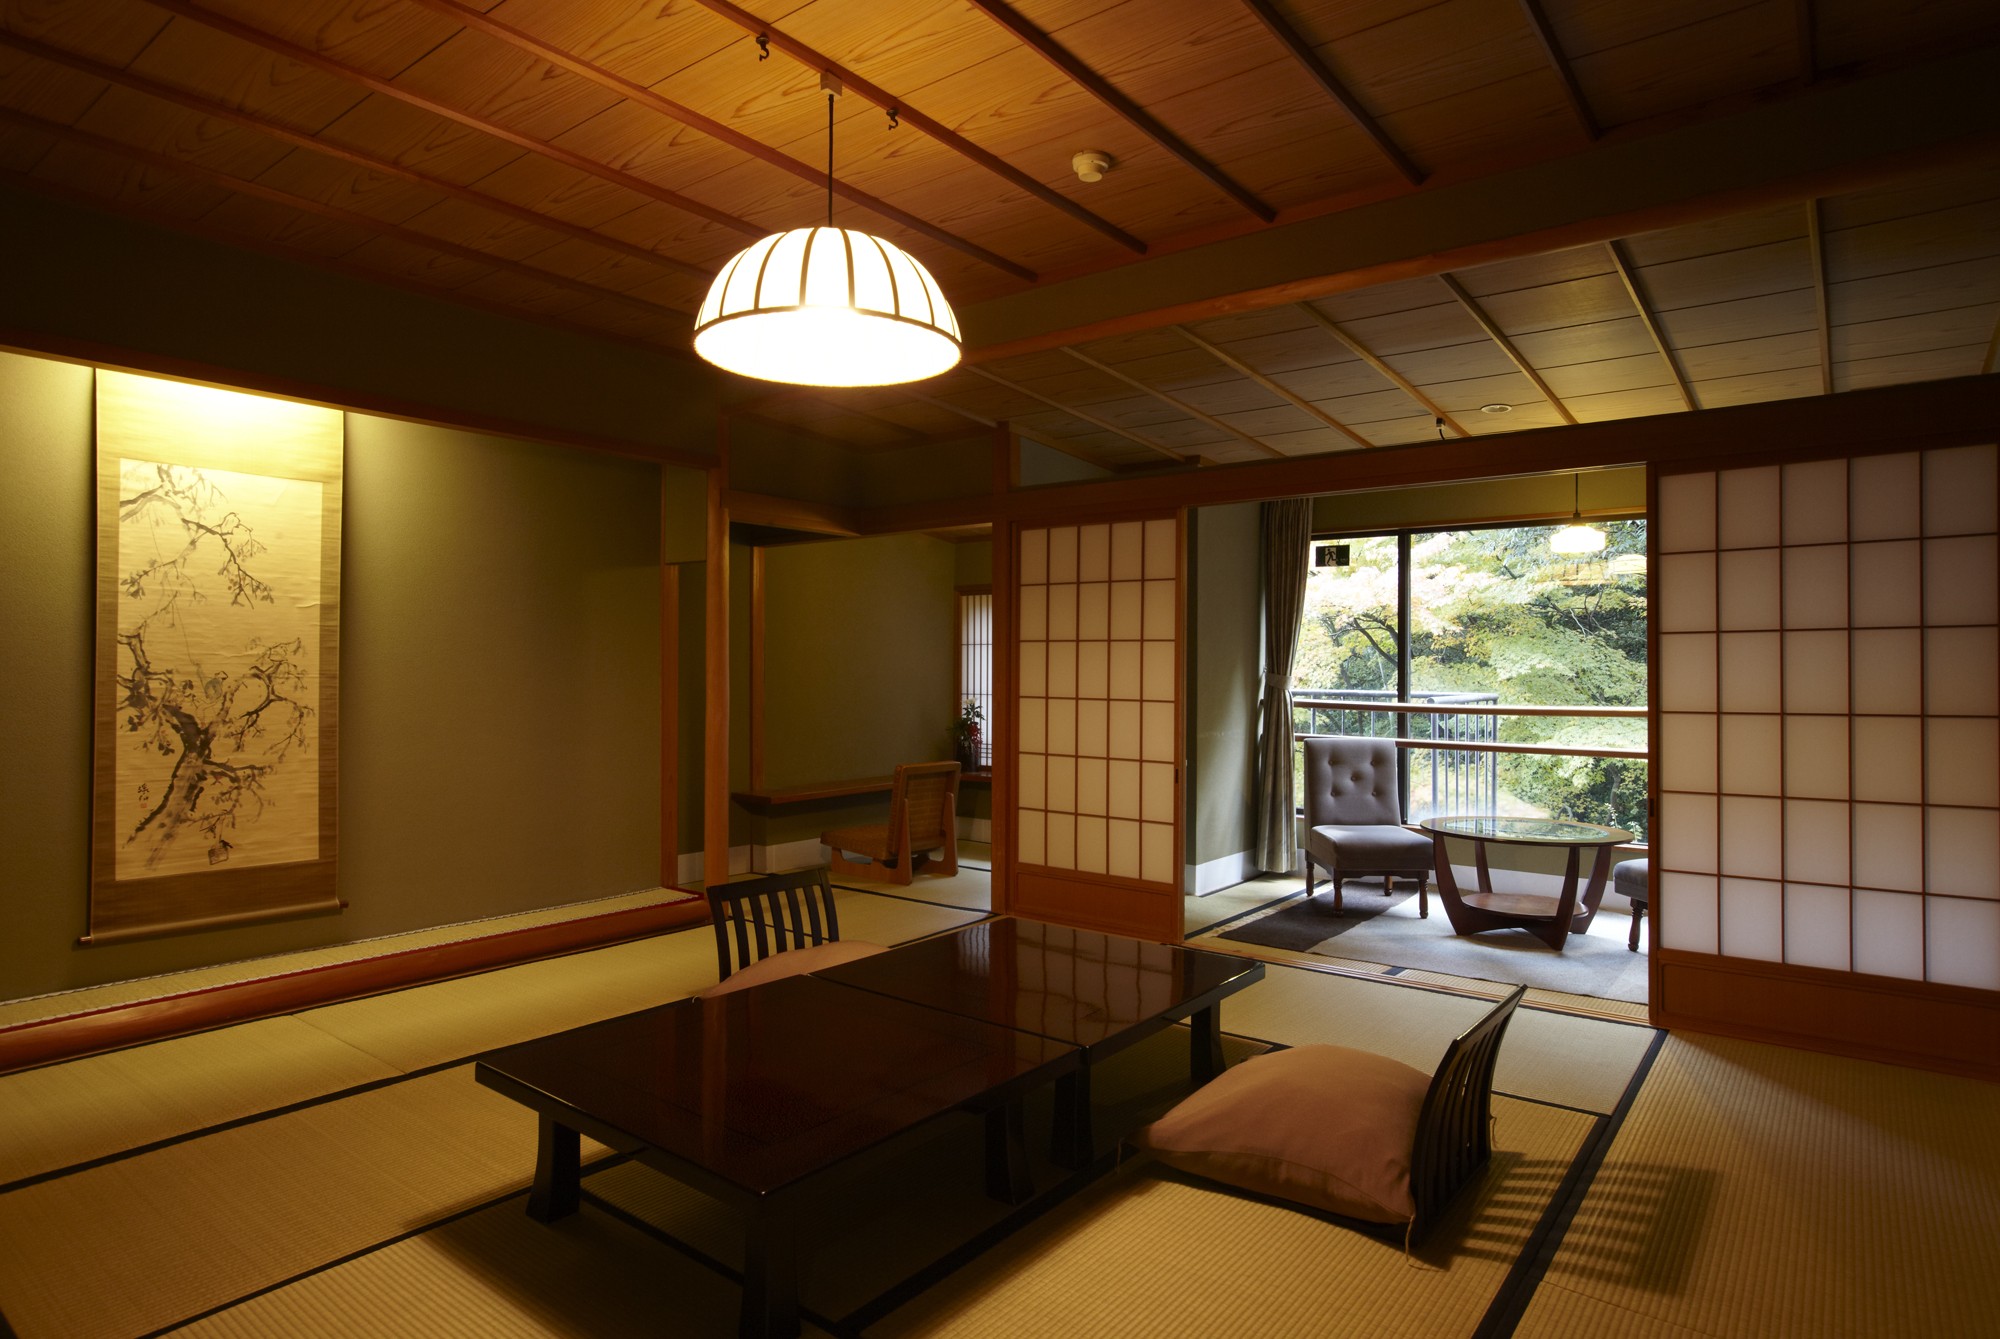 A room at the Araya Totoan